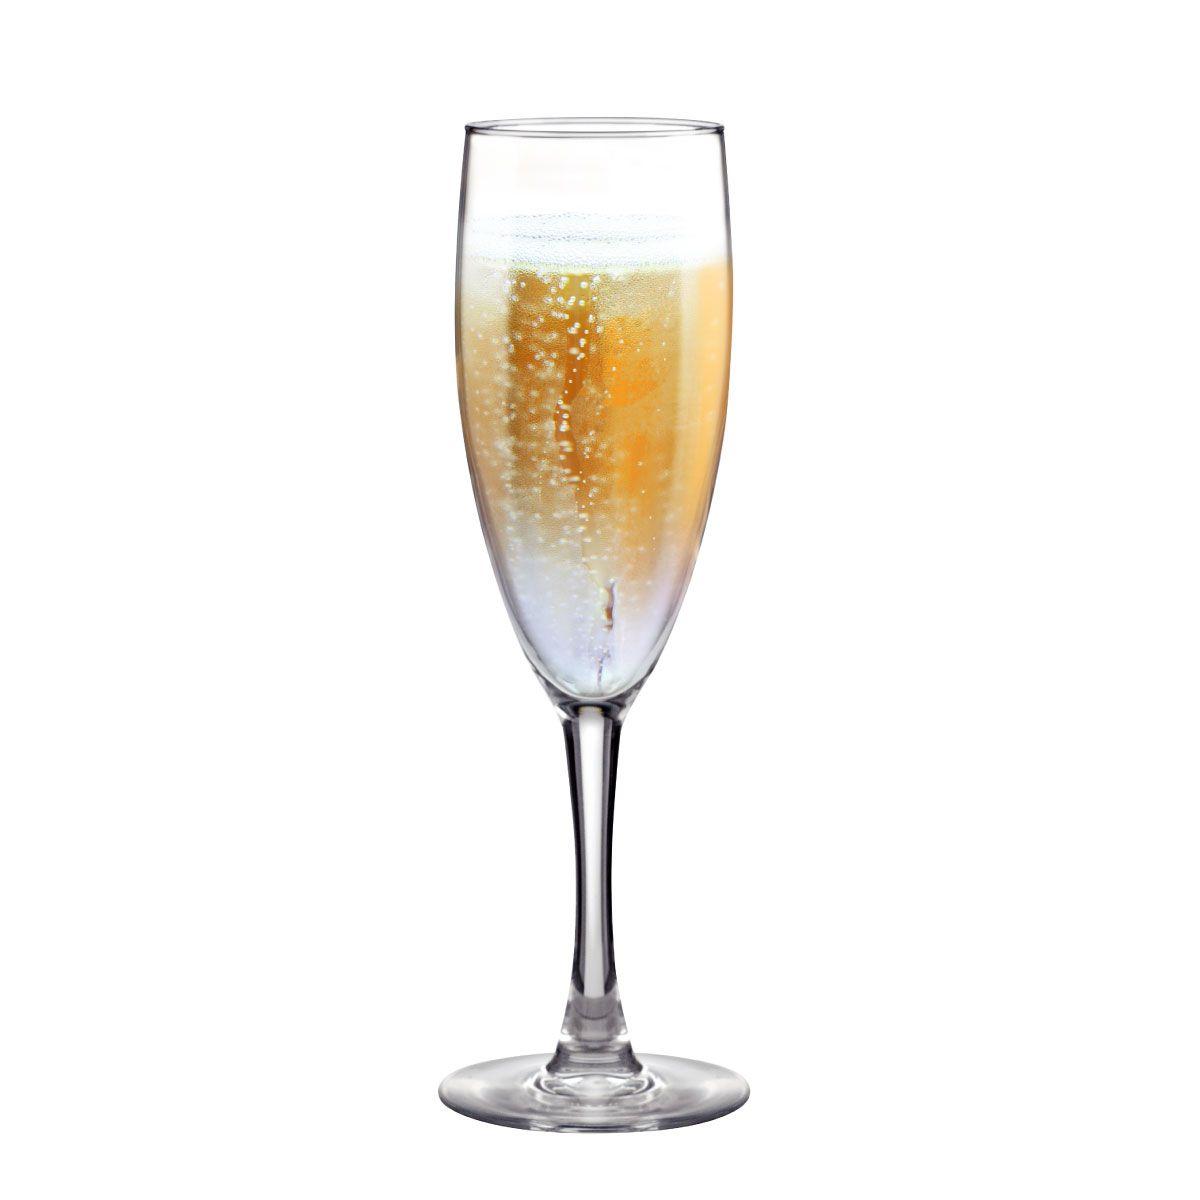 Taça Champagne - Ritz 175ml